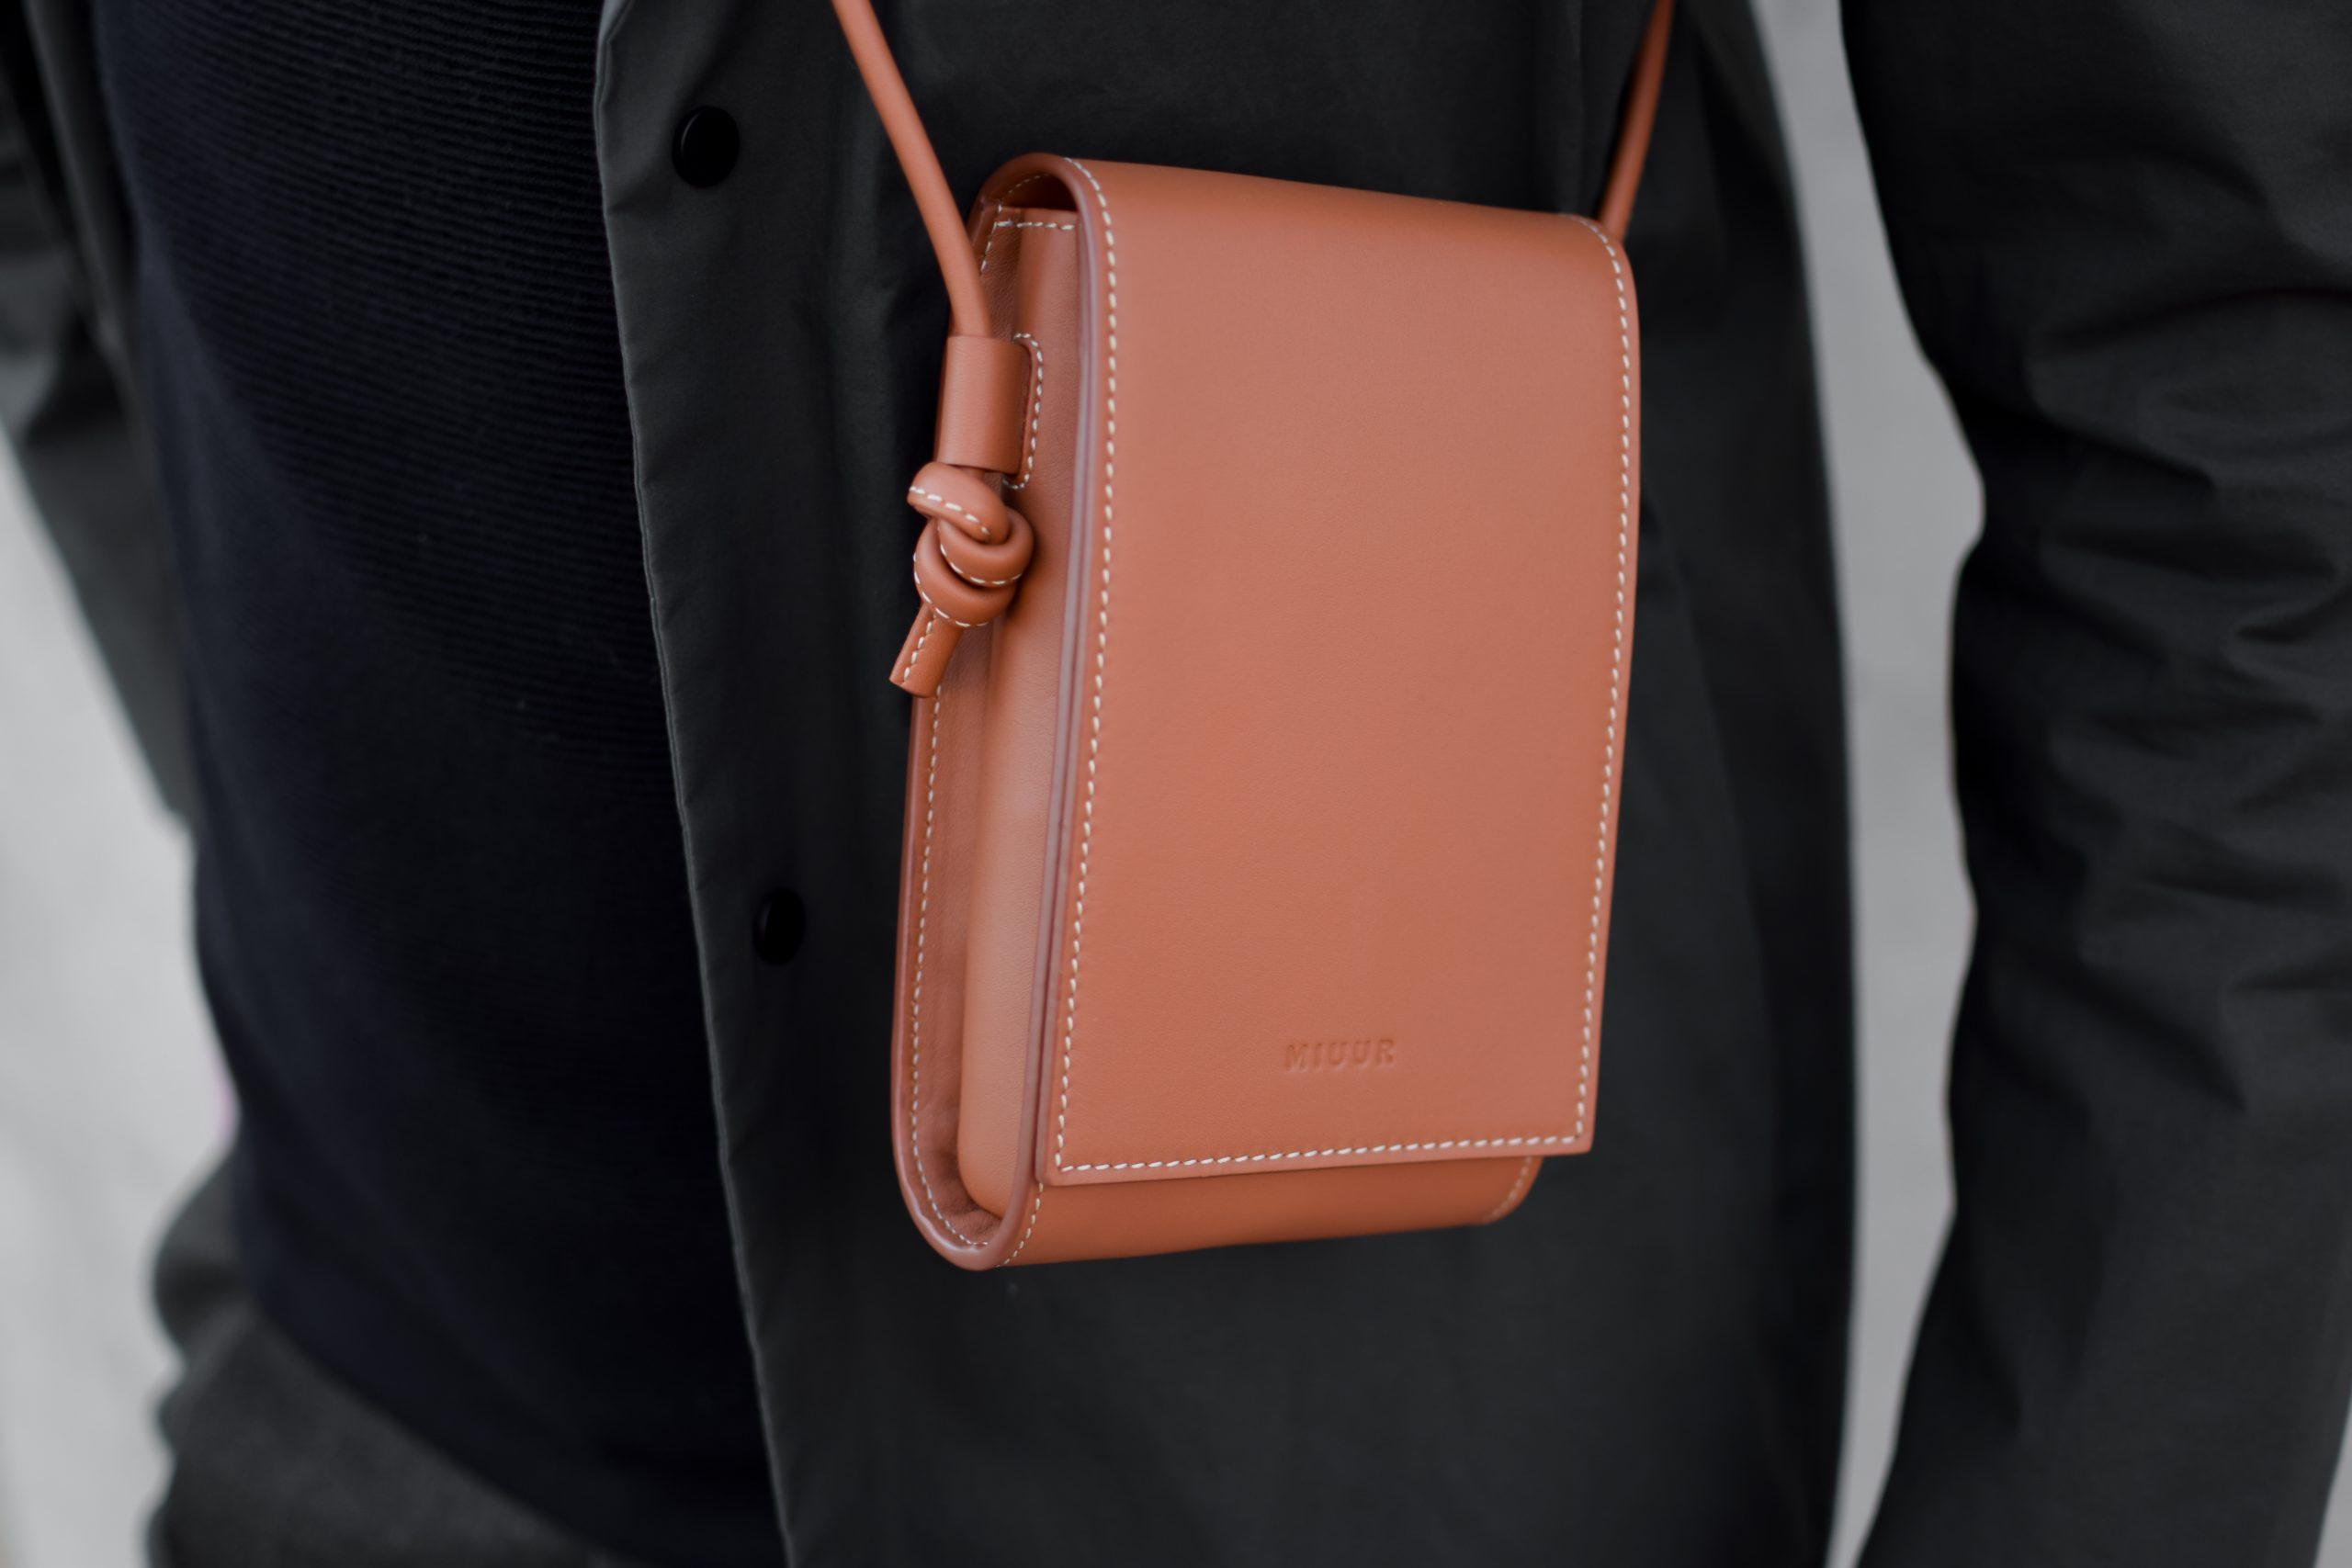 miuur paquito minibag pouch havana brown marron